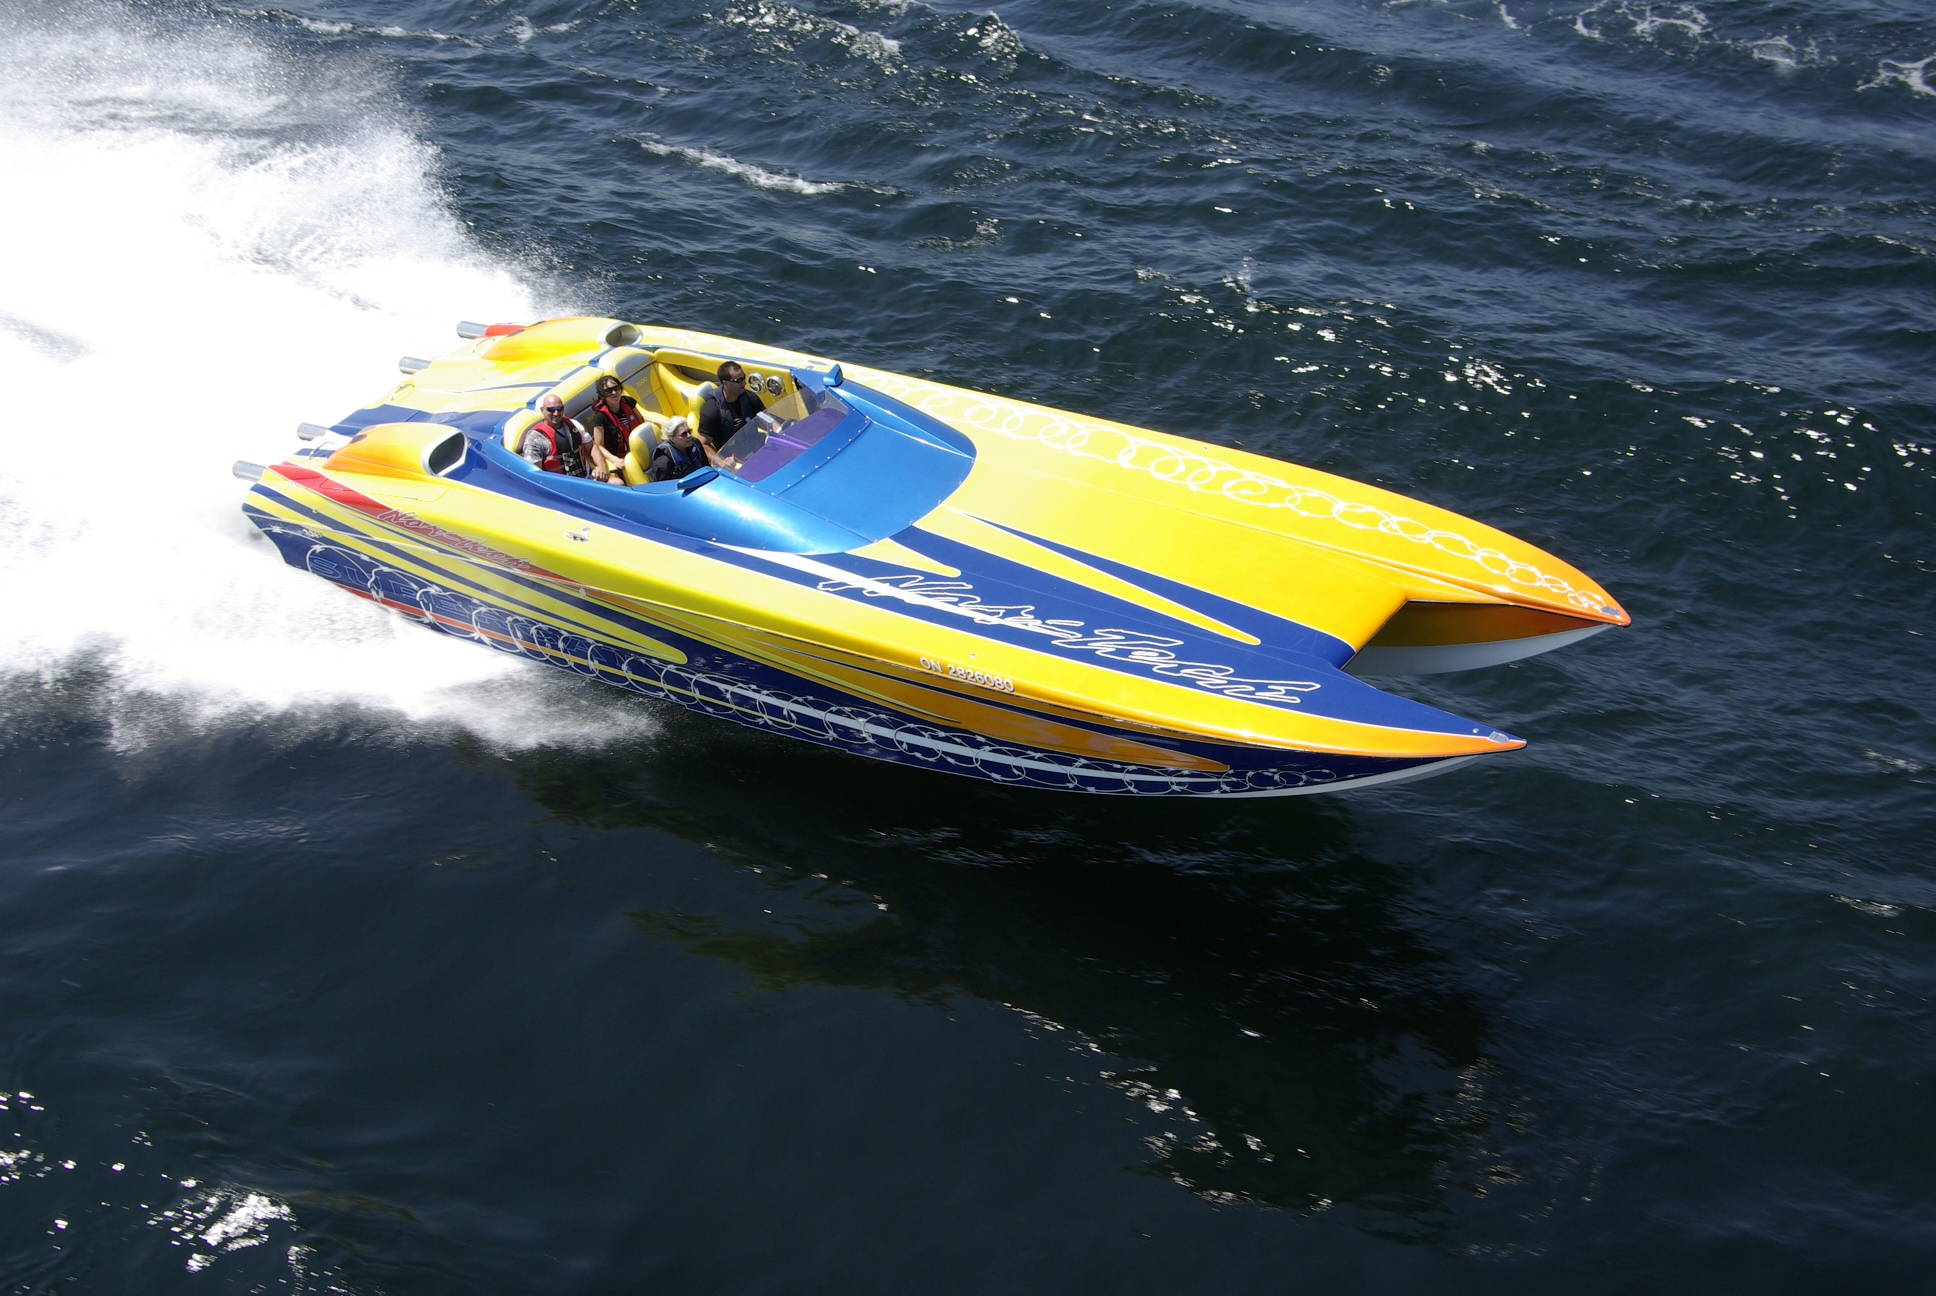 Mike Facchin 36 NorTech Supercat